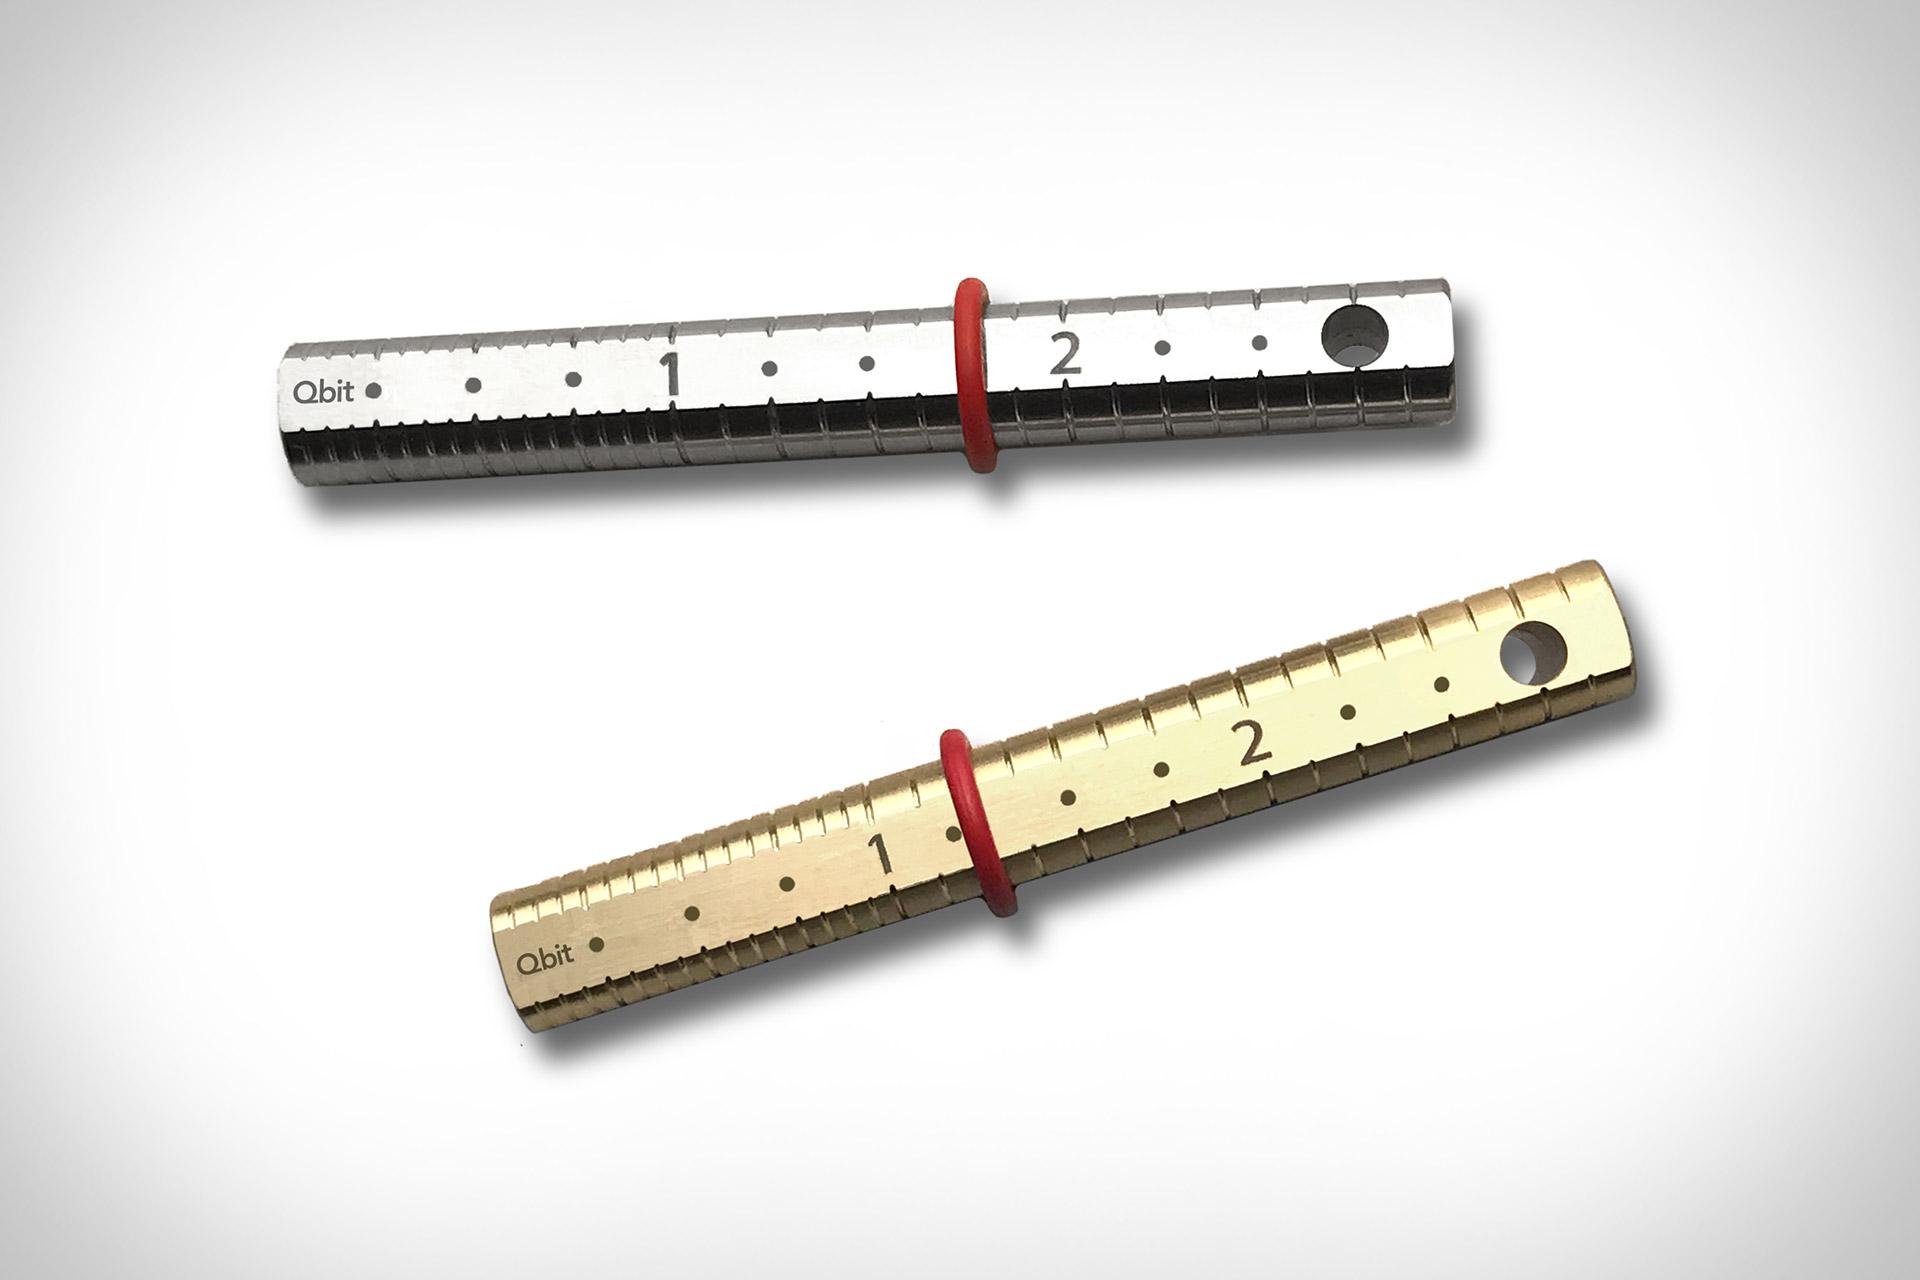 Qbit Keychain Measuring Tool